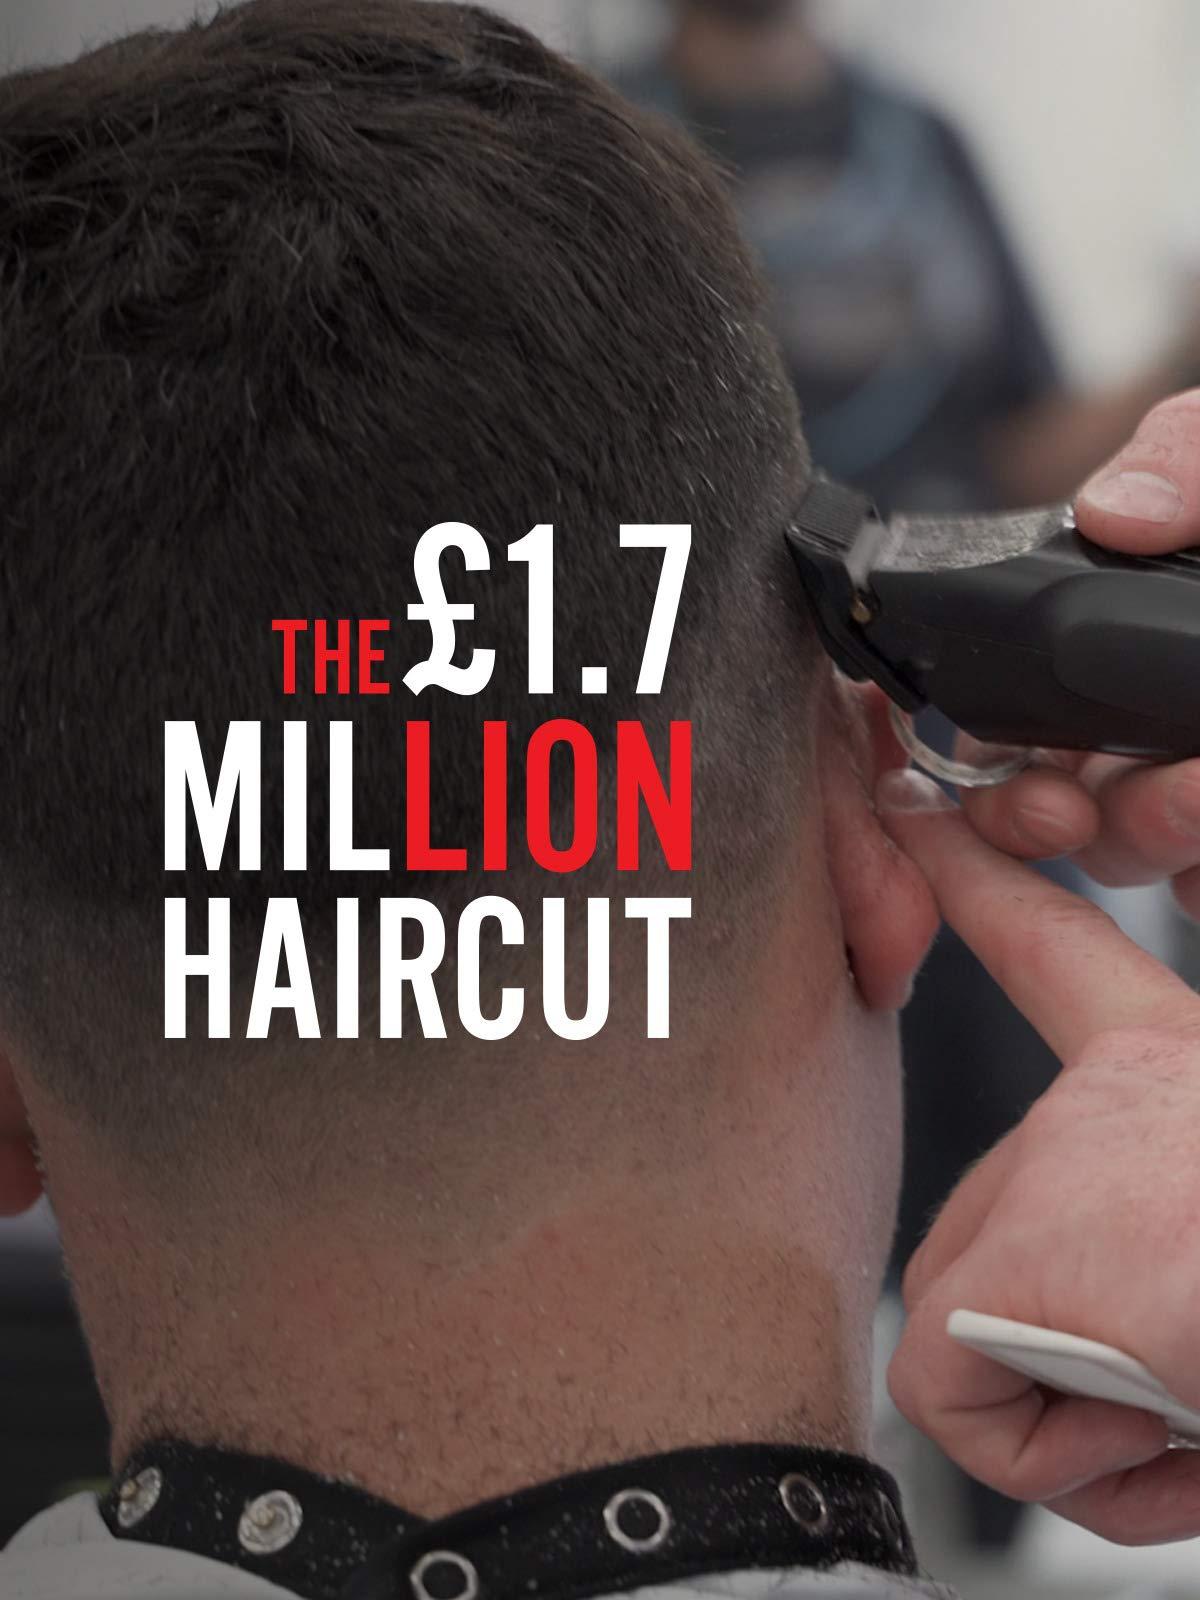 The 1.7 Million Pound Haircut